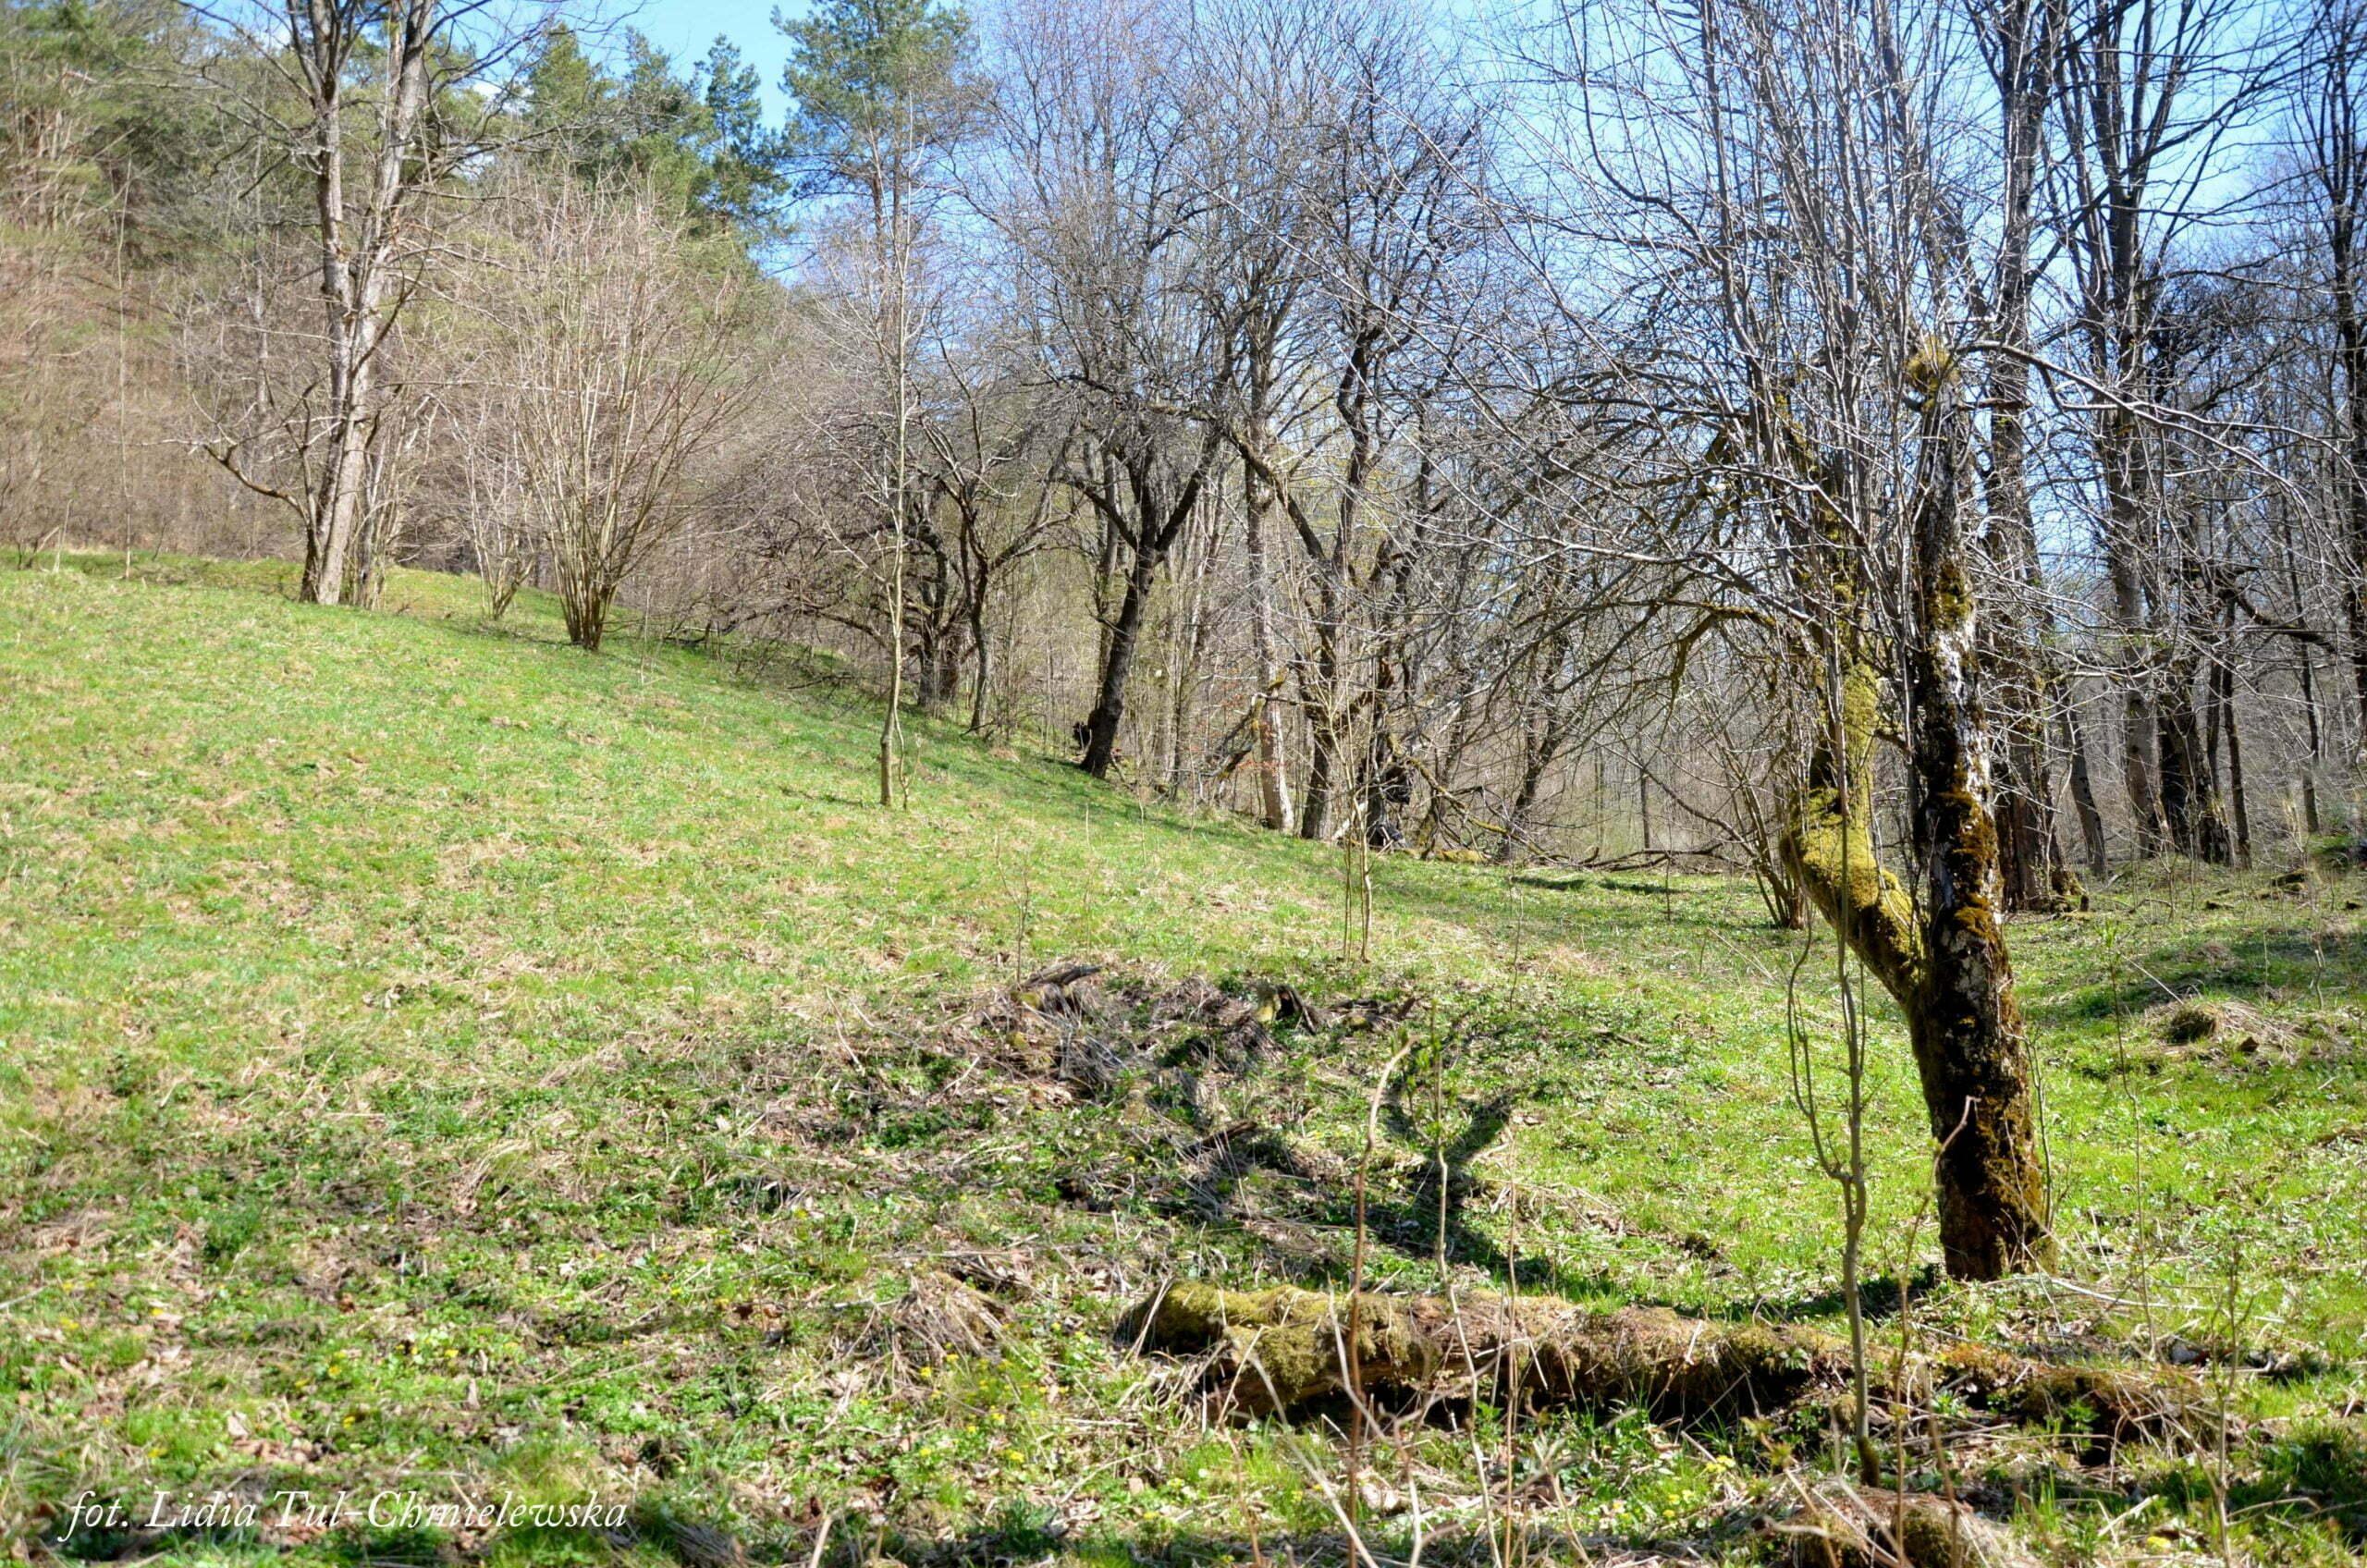 Naturalne ukształtowanie terenu wsi Choceń / fot. Lidia Tul-Chmielewska